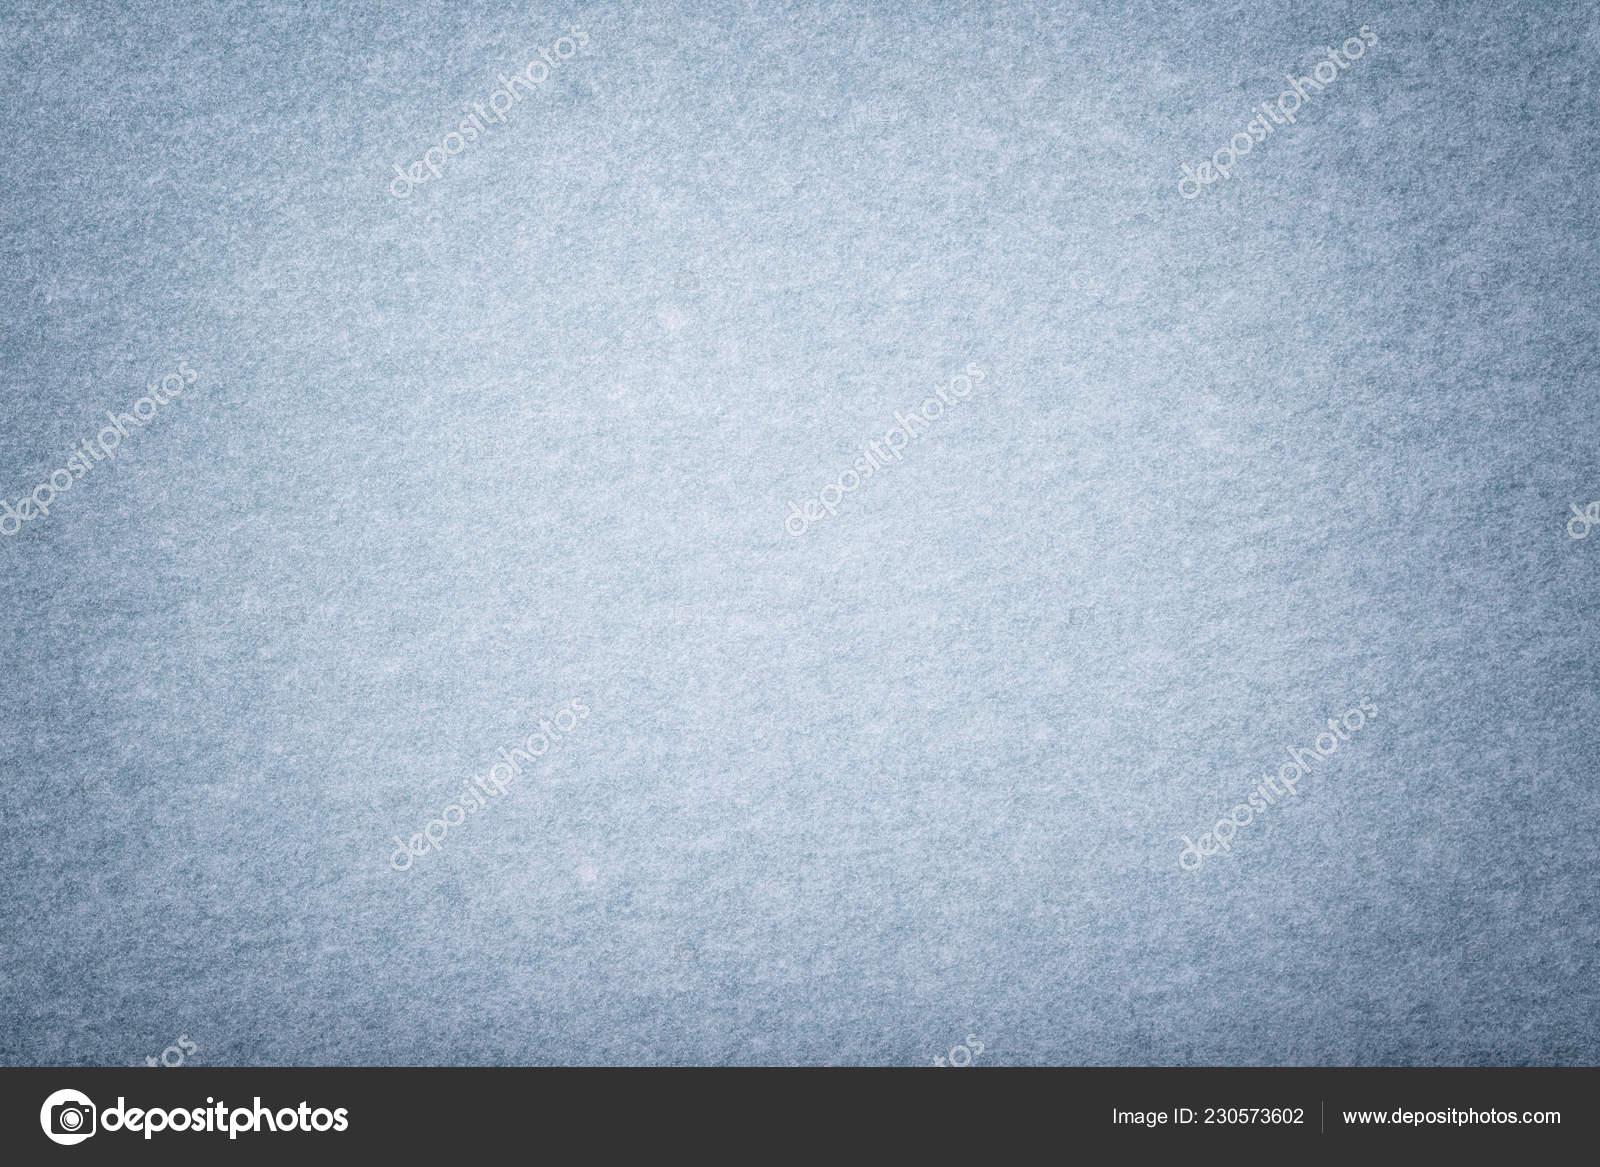 Light Blue Matte Background Suede Fabric Closeup Velvet Texture Seamless Stock Photo C Nikol85 230573602